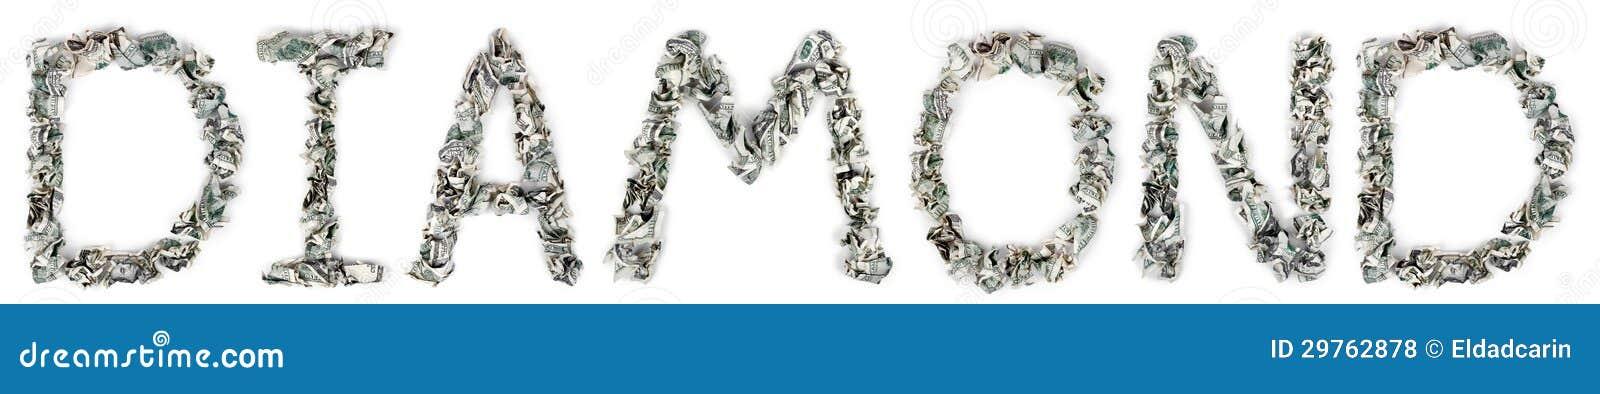 Diamond - Crimped 100$ Bills